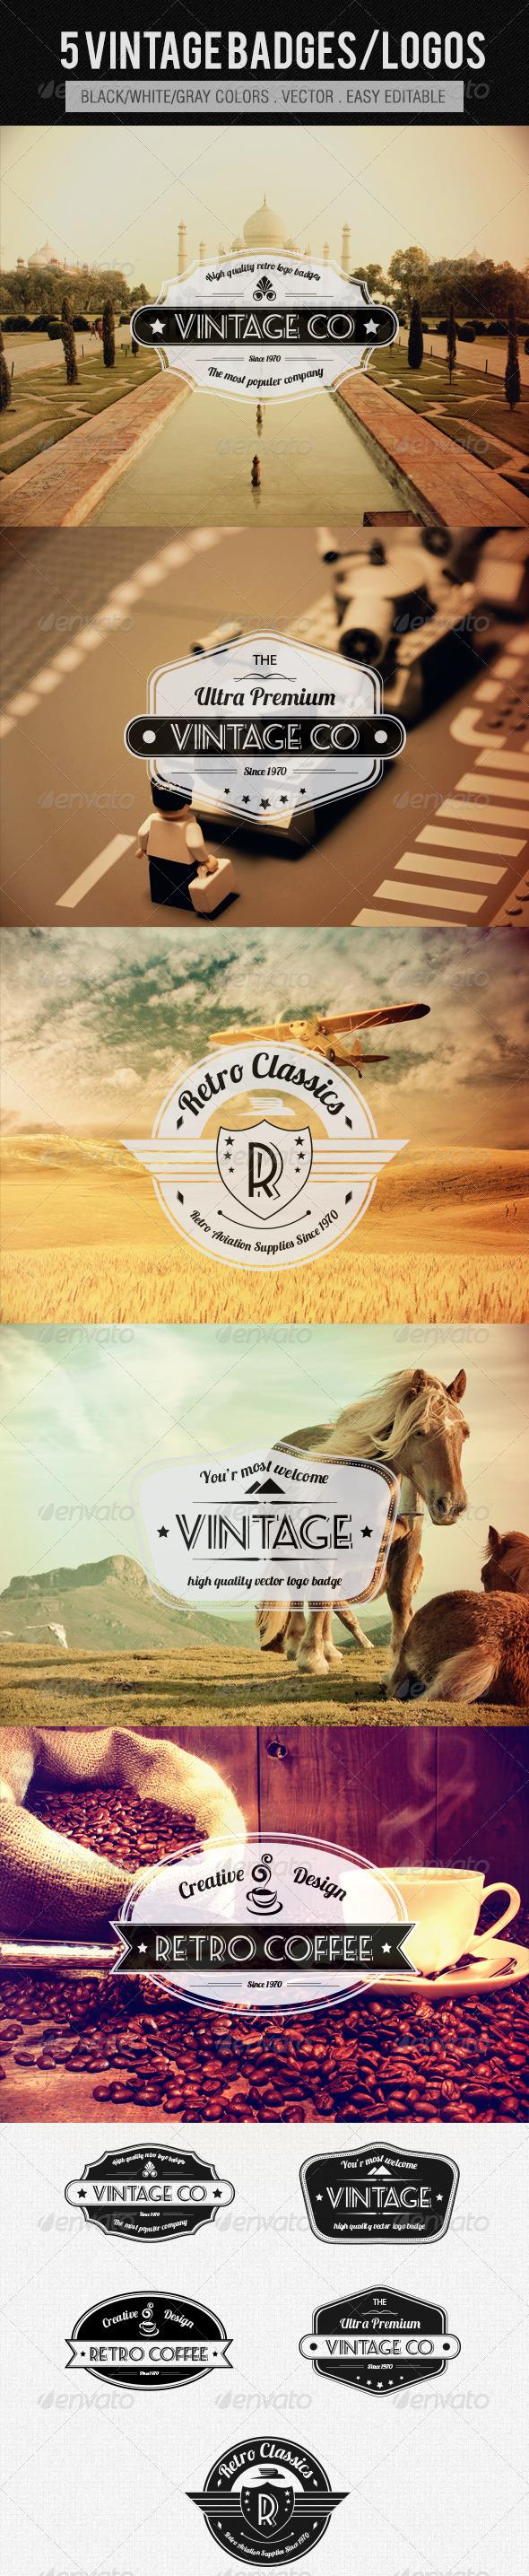 Vintage Logos/Badges - Badges & Stickers Web Elements